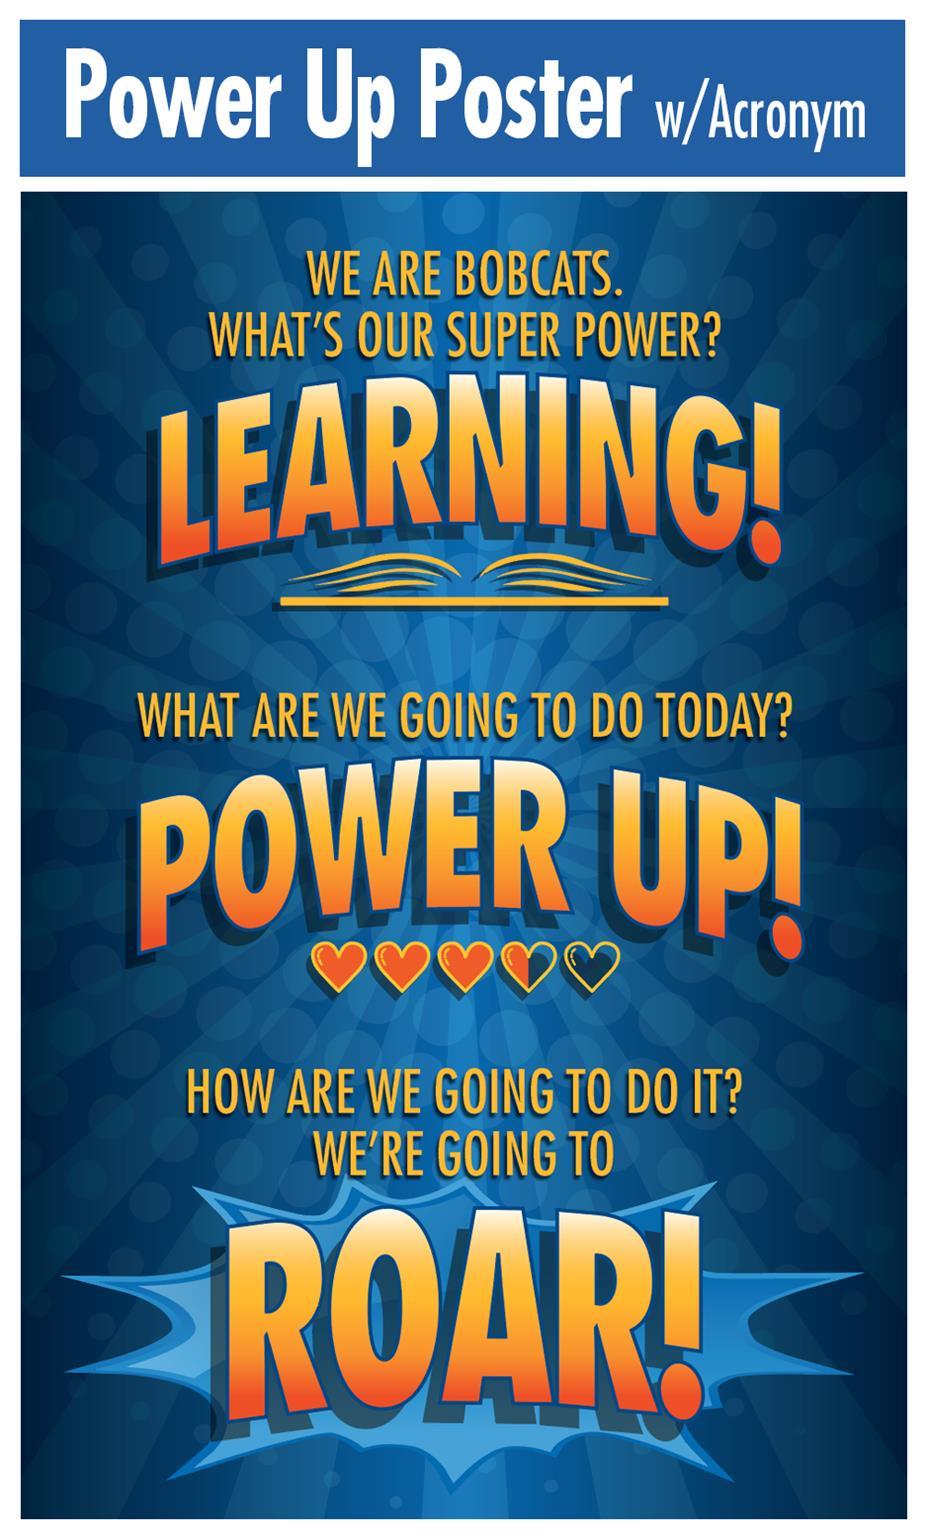 Power Up Poster ROAR